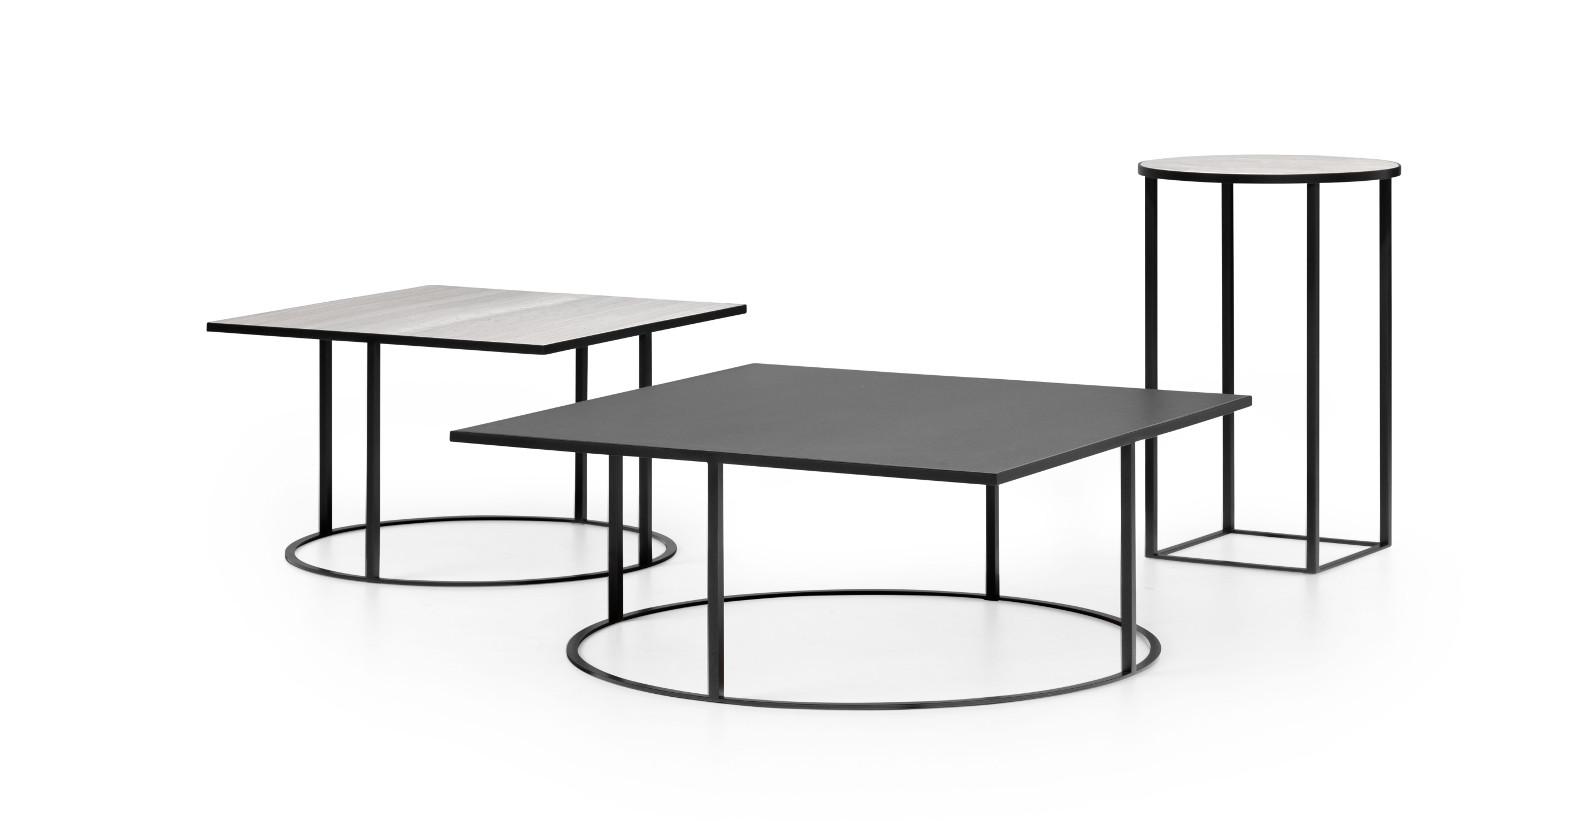 Design Salontafel Leolux.Salontafels Troost Interieurs